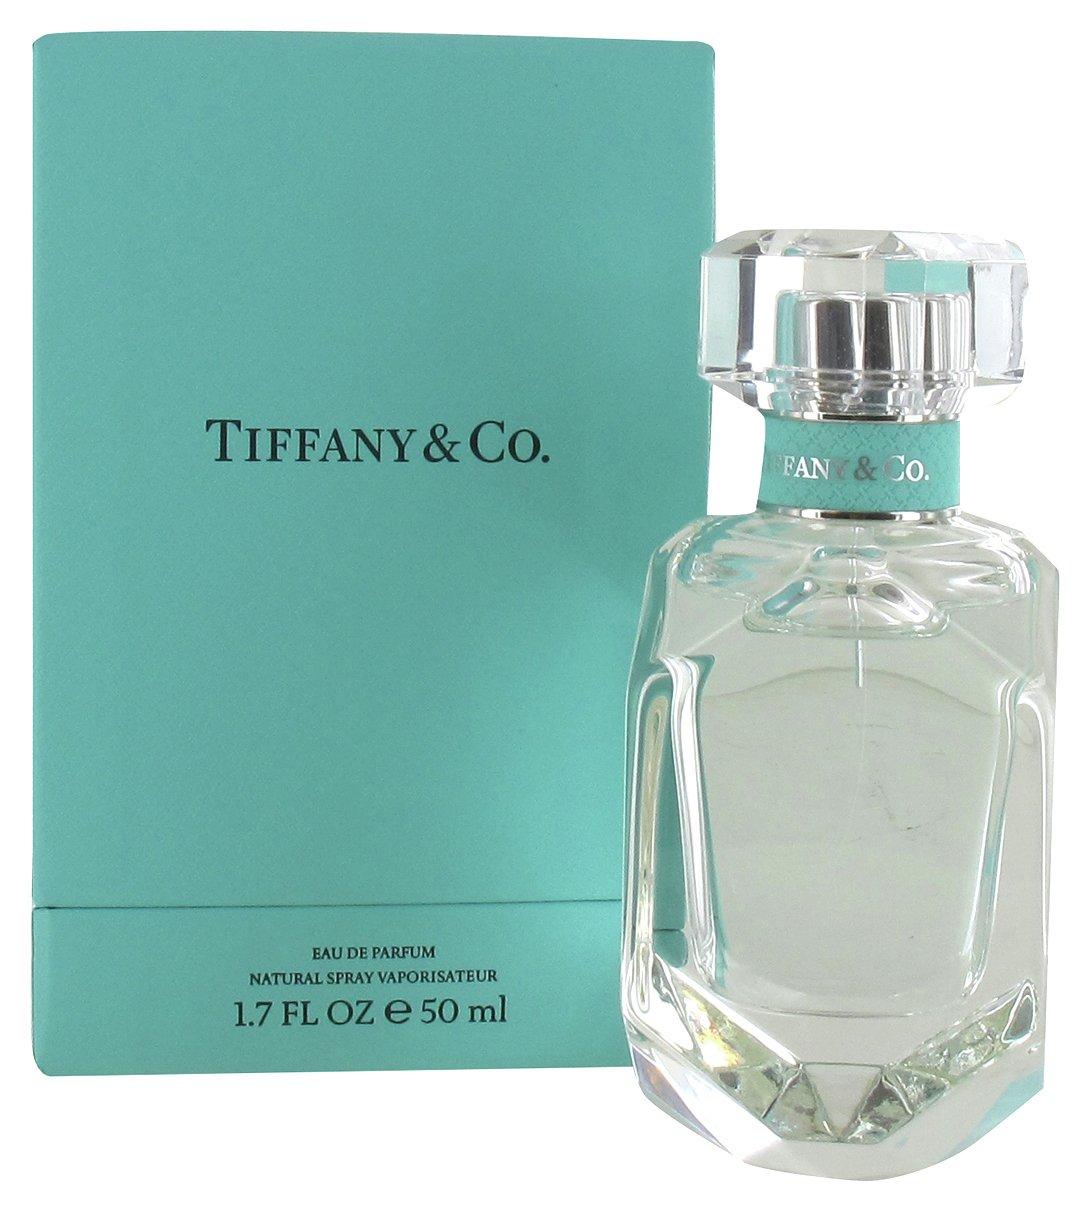 Tiffany & Co for Women Eau De Parfum - 50ml